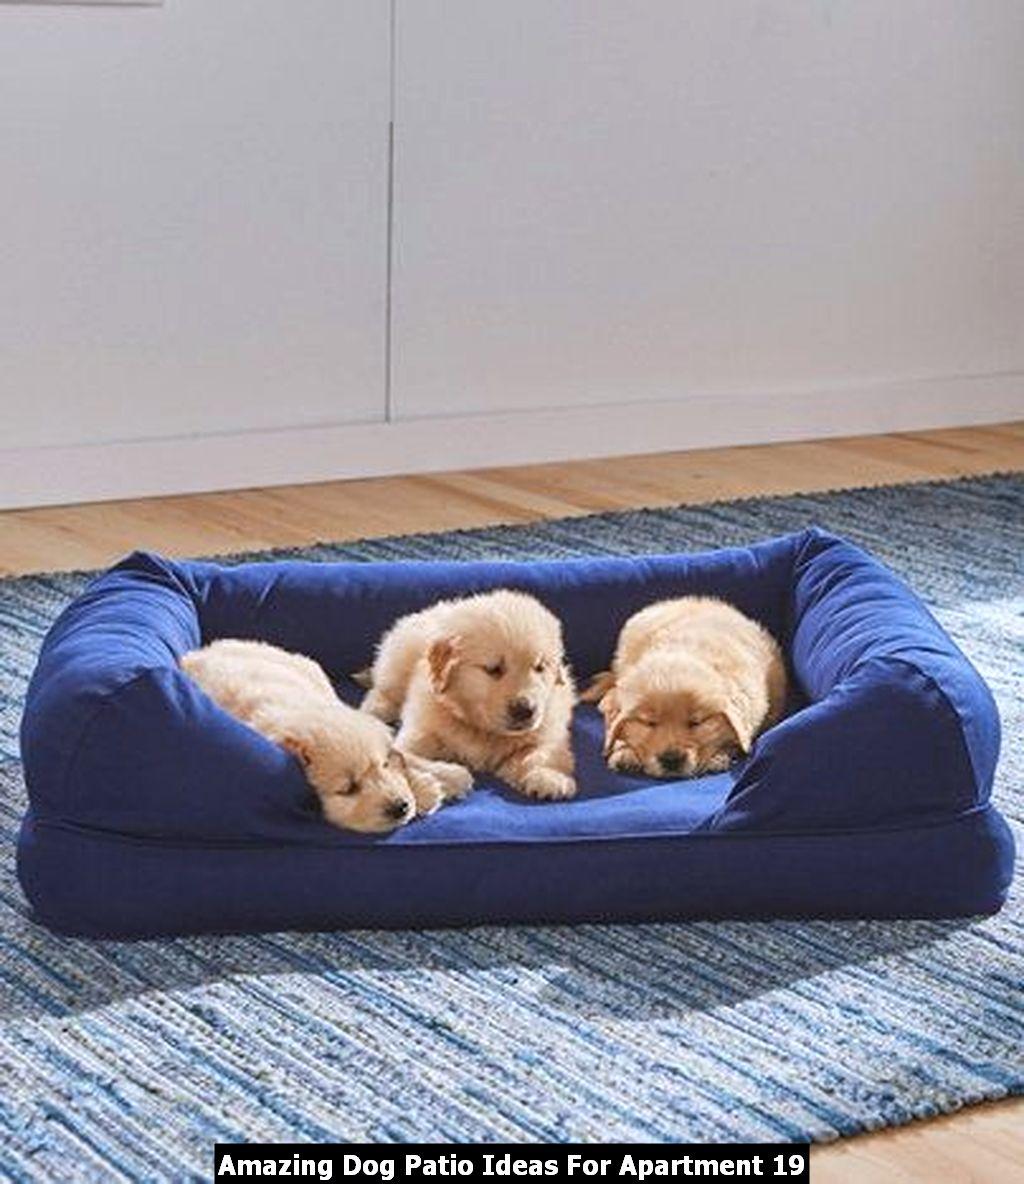 Amazing Dog Patio Ideas For Apartment 19